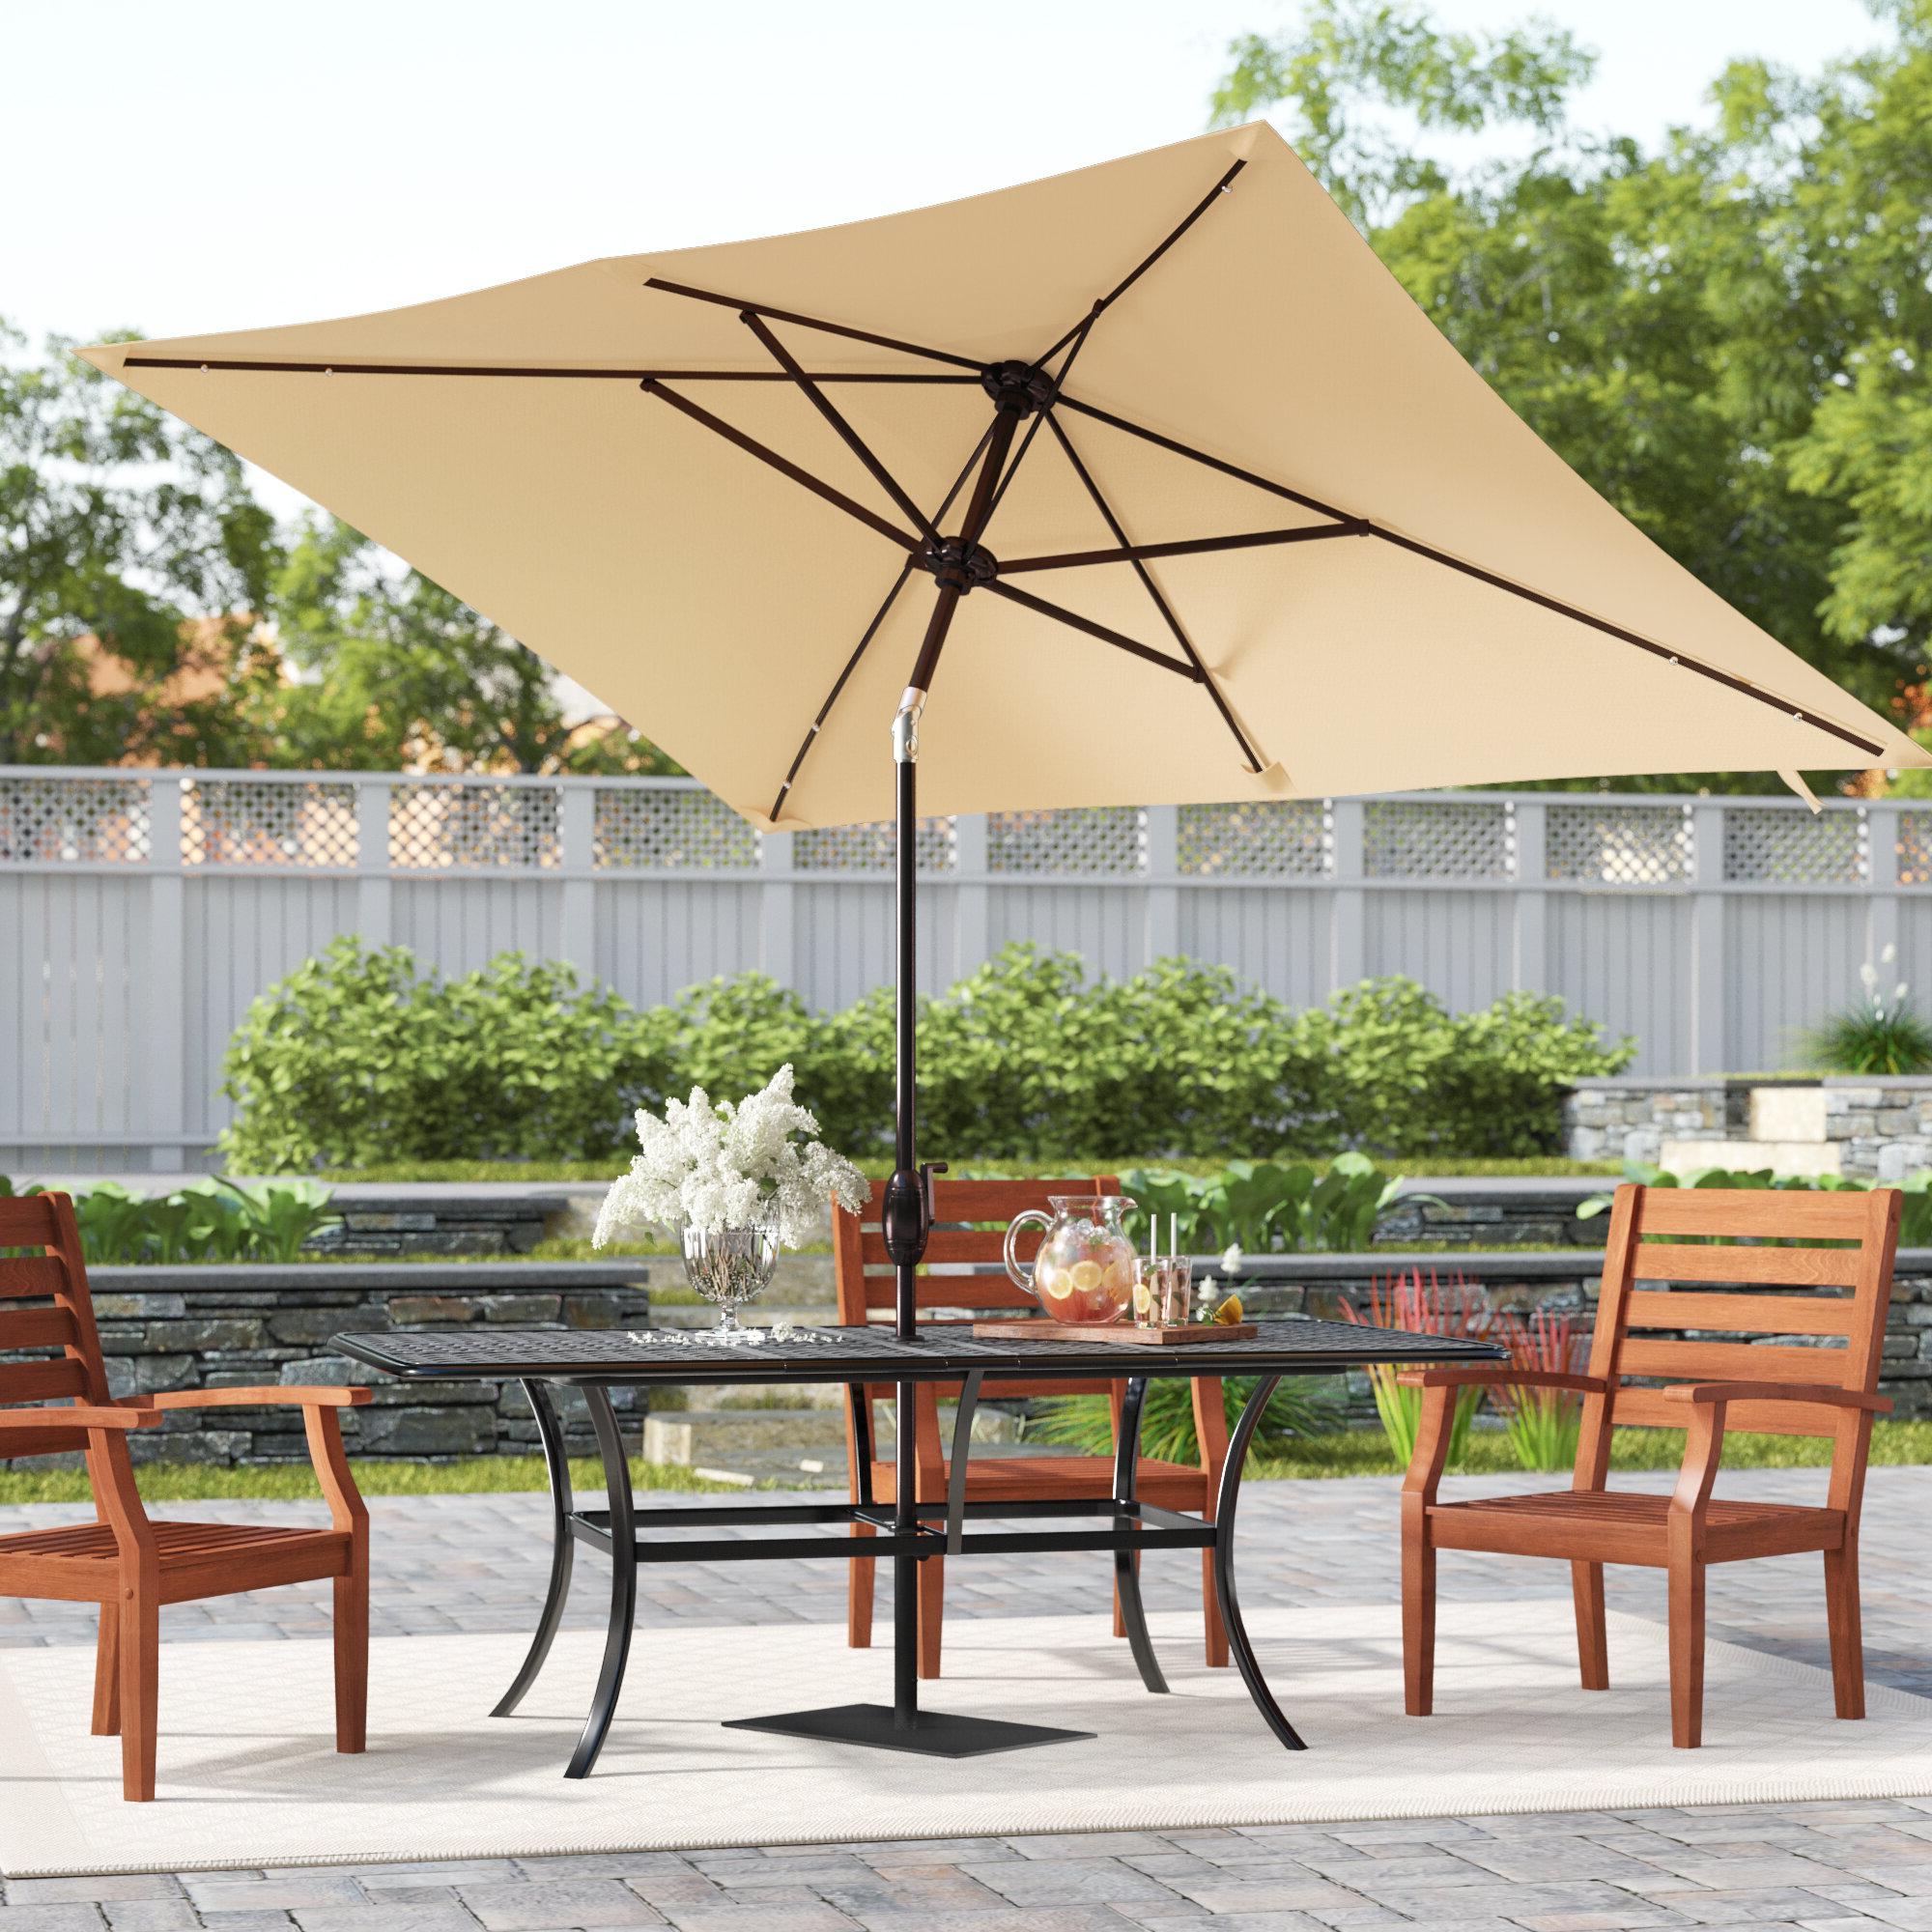 Jerrell 10' X 7' Rectangular Market Umbrella Throughout Newest Norah Rectangular Market Umbrellas (View 9 of 20)